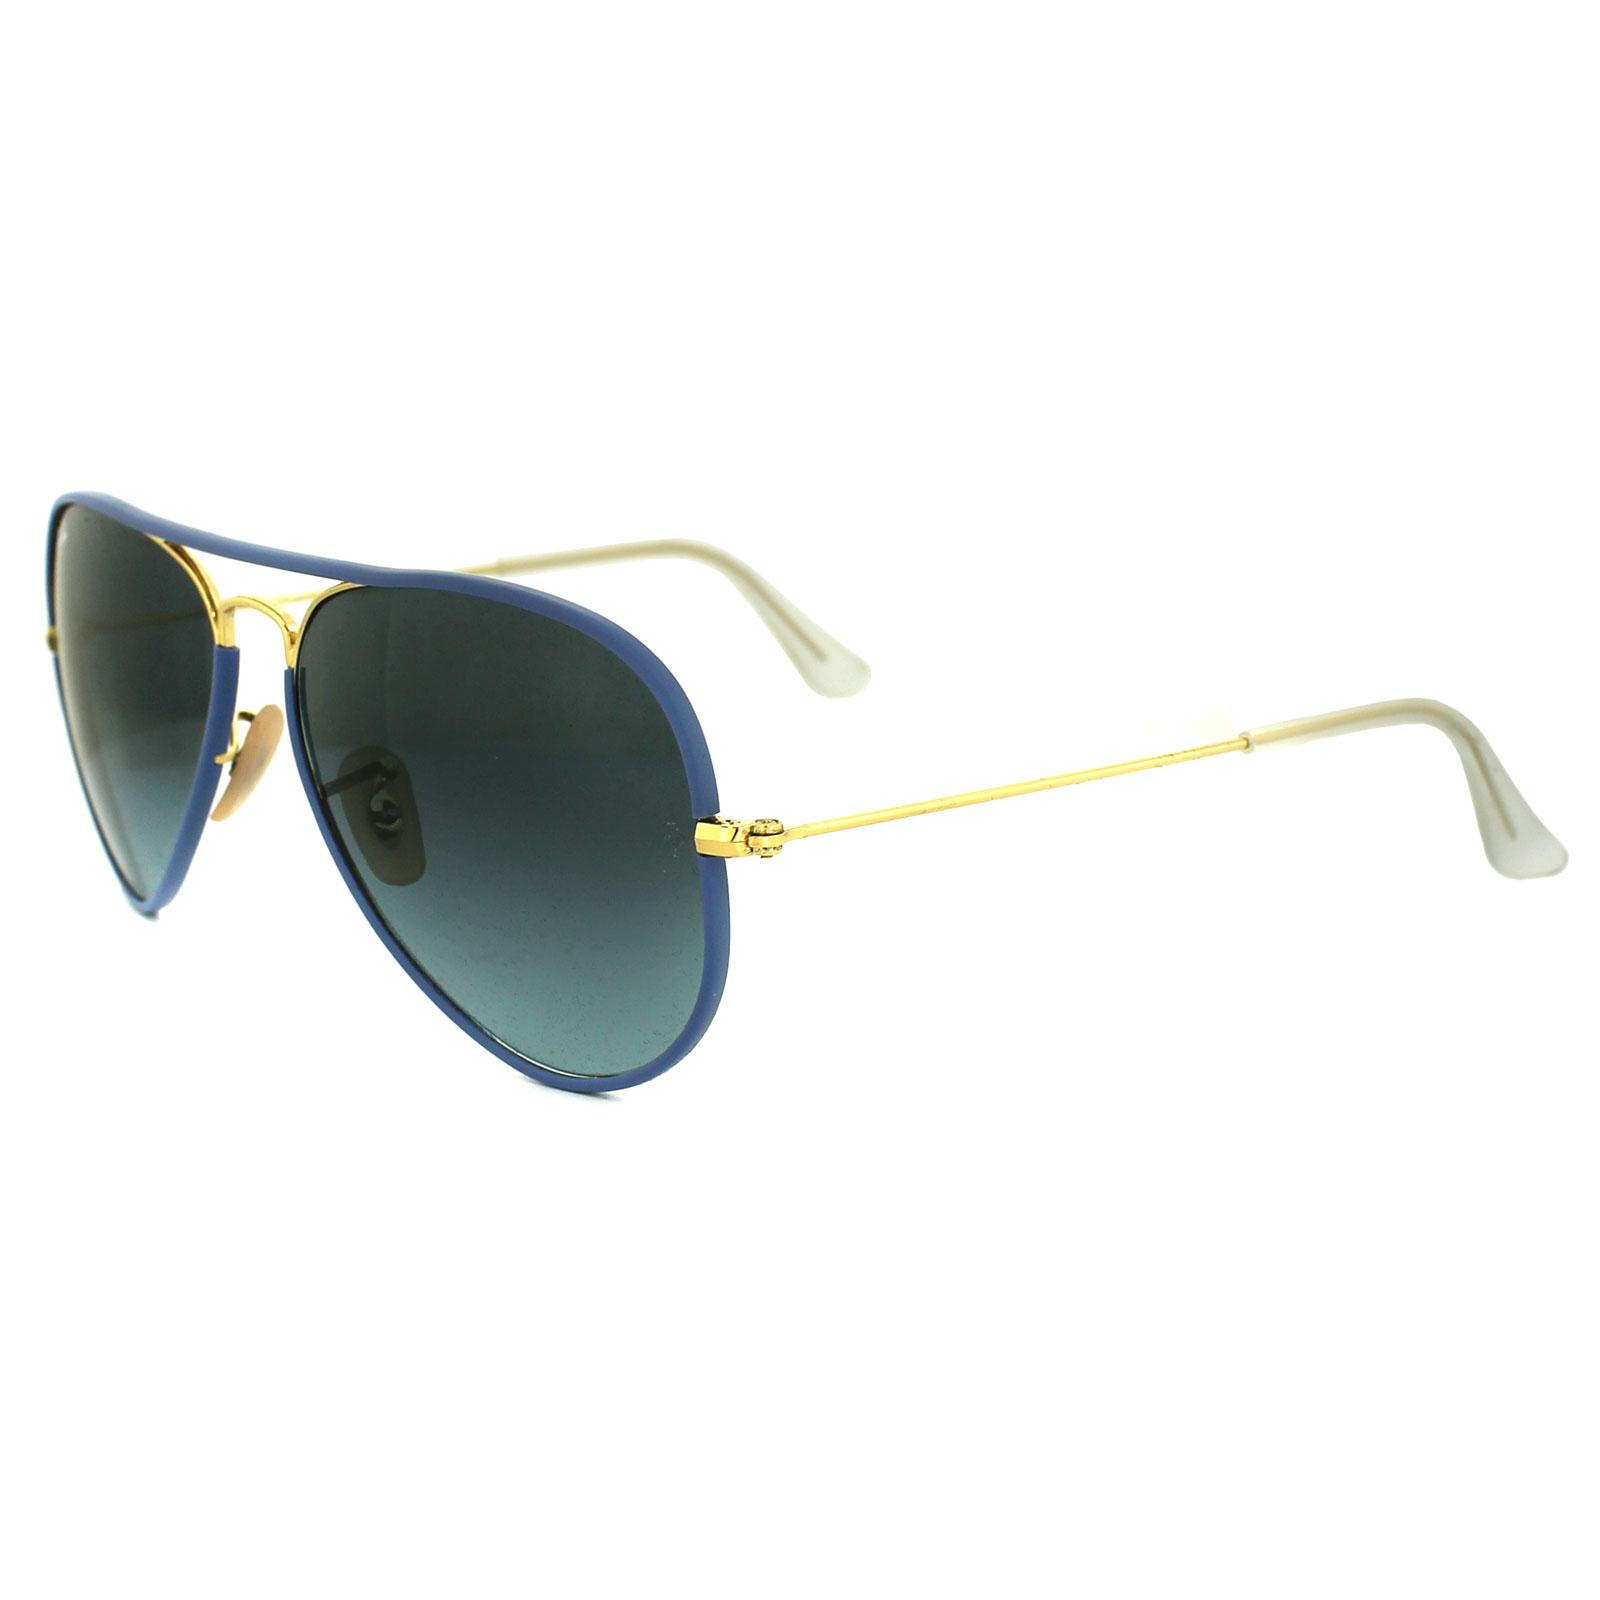 f6c7c542a1e Ray-Ban Sunglasses Aviator Full Colour 3025JM 001 4M Gold  u0026amp  Blue